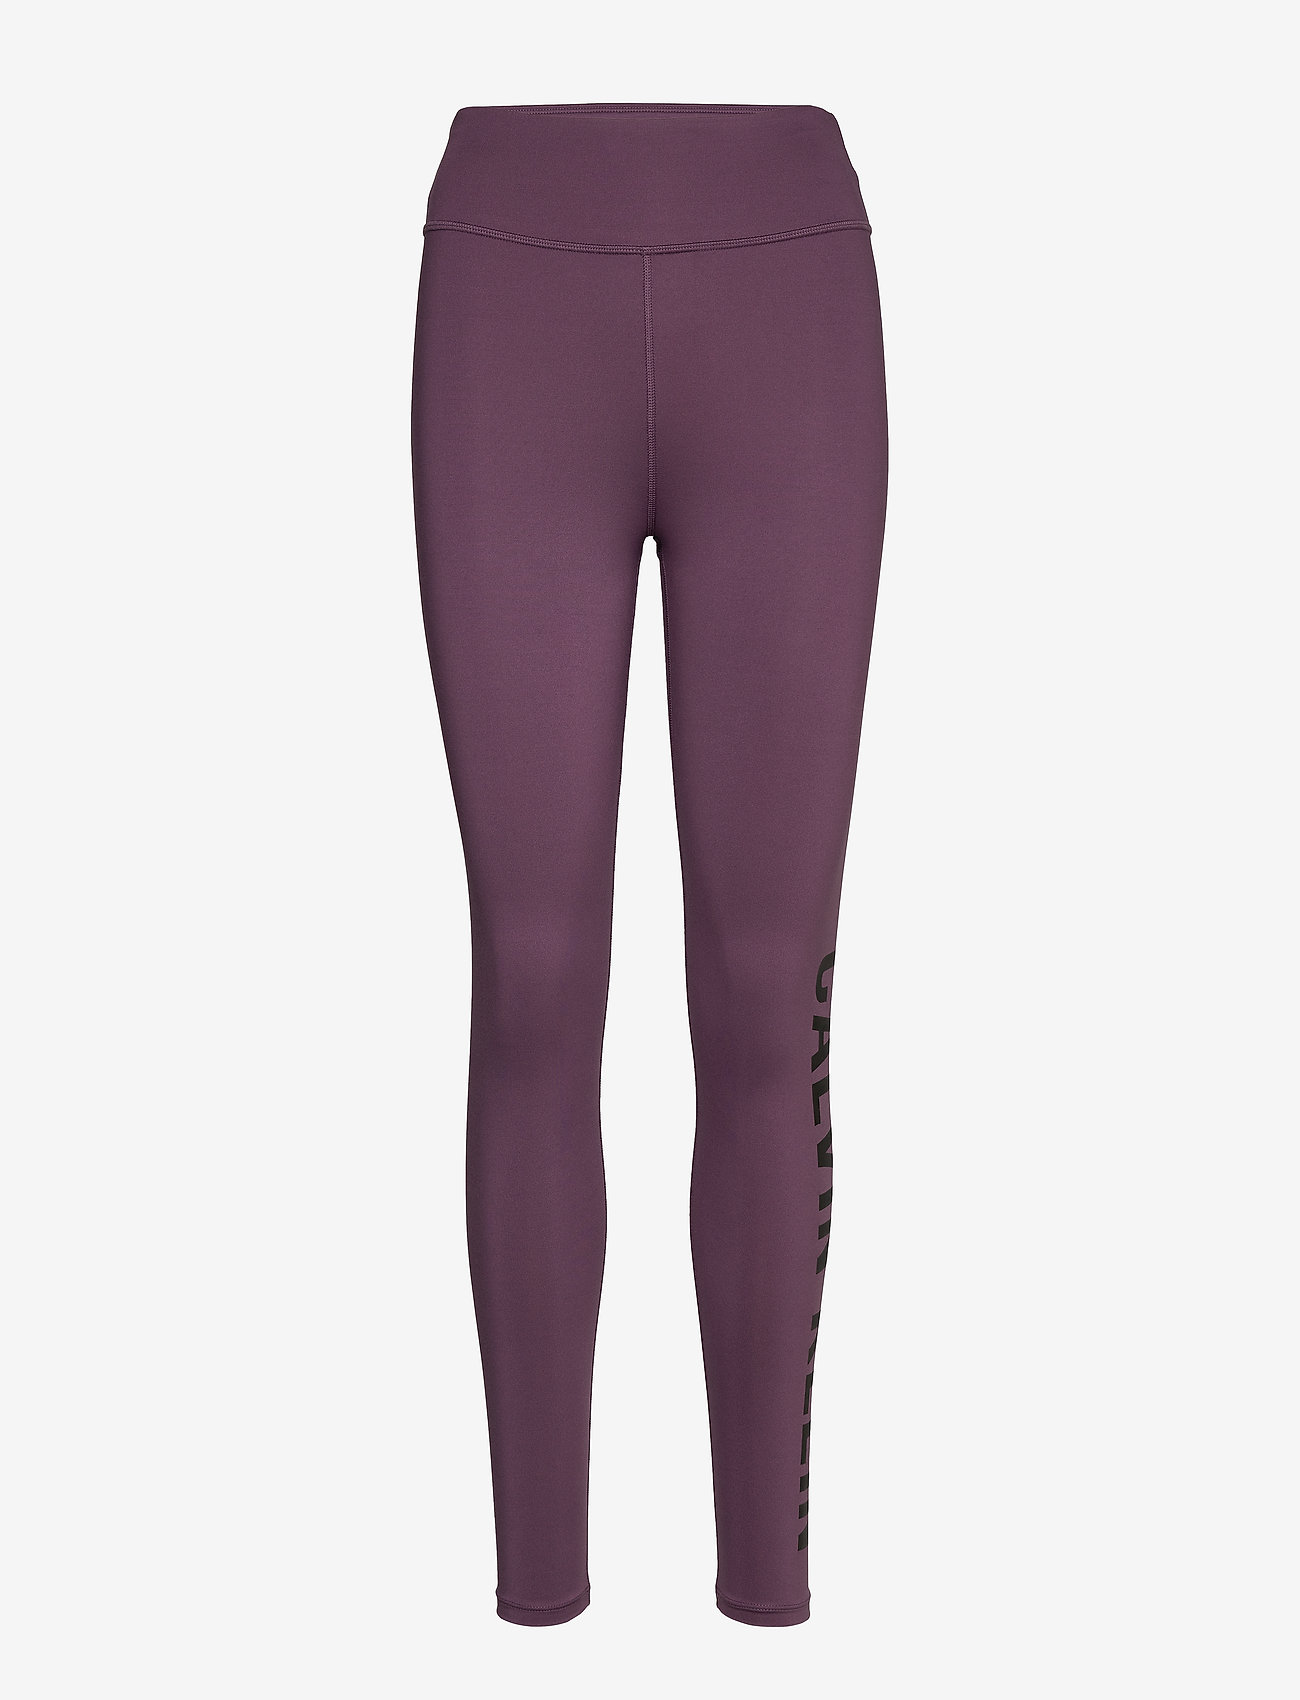 Calvin Klein Performance - FULL LENGTH TIGHT - running & training tights - vintage violet - 0